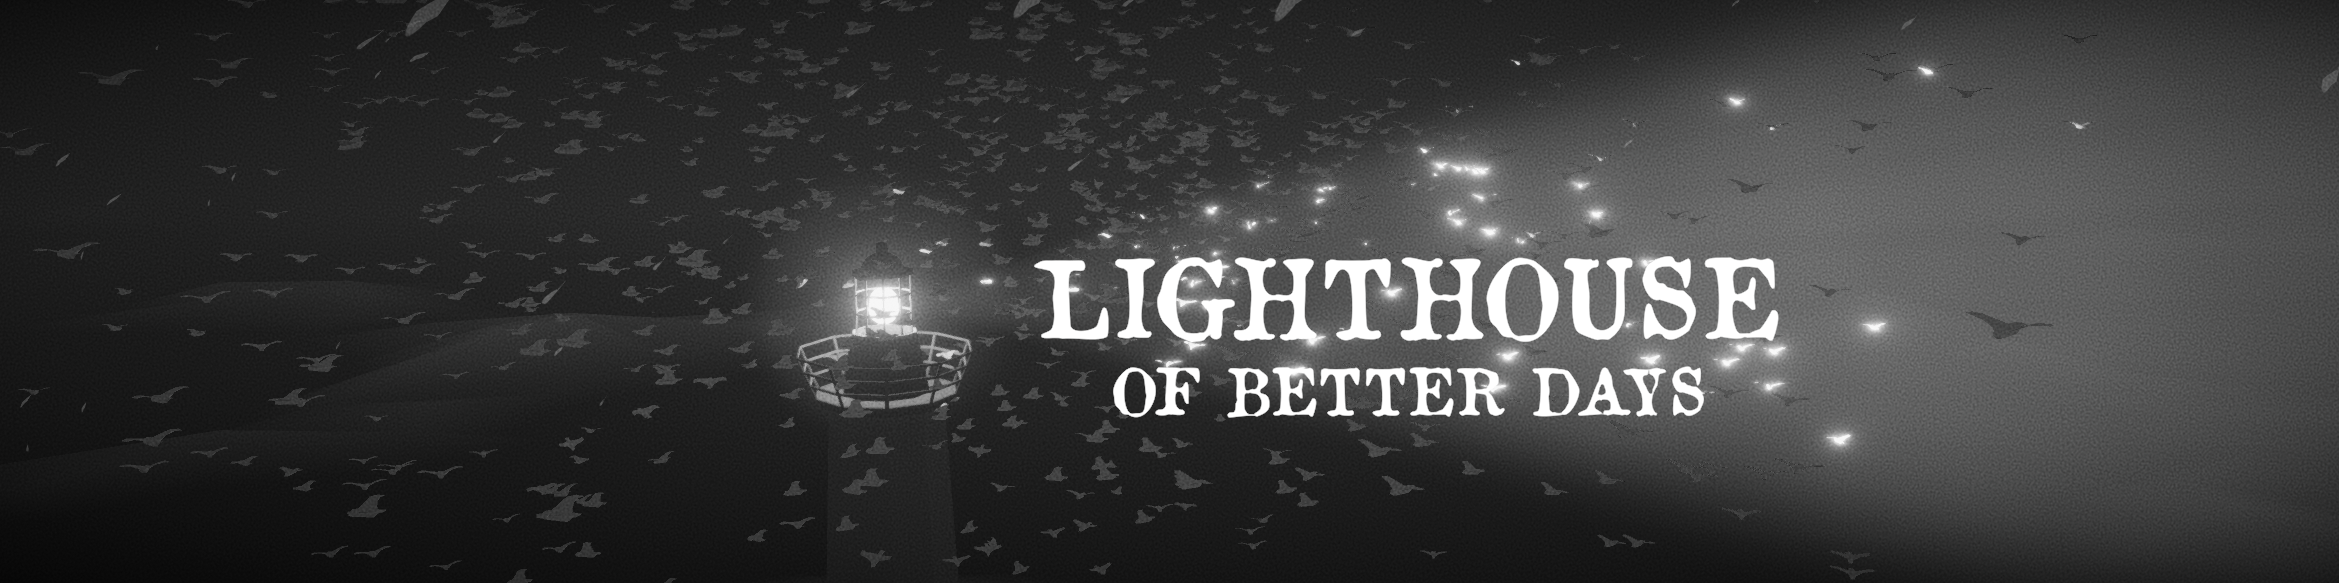 Lighthouse Of Better Days